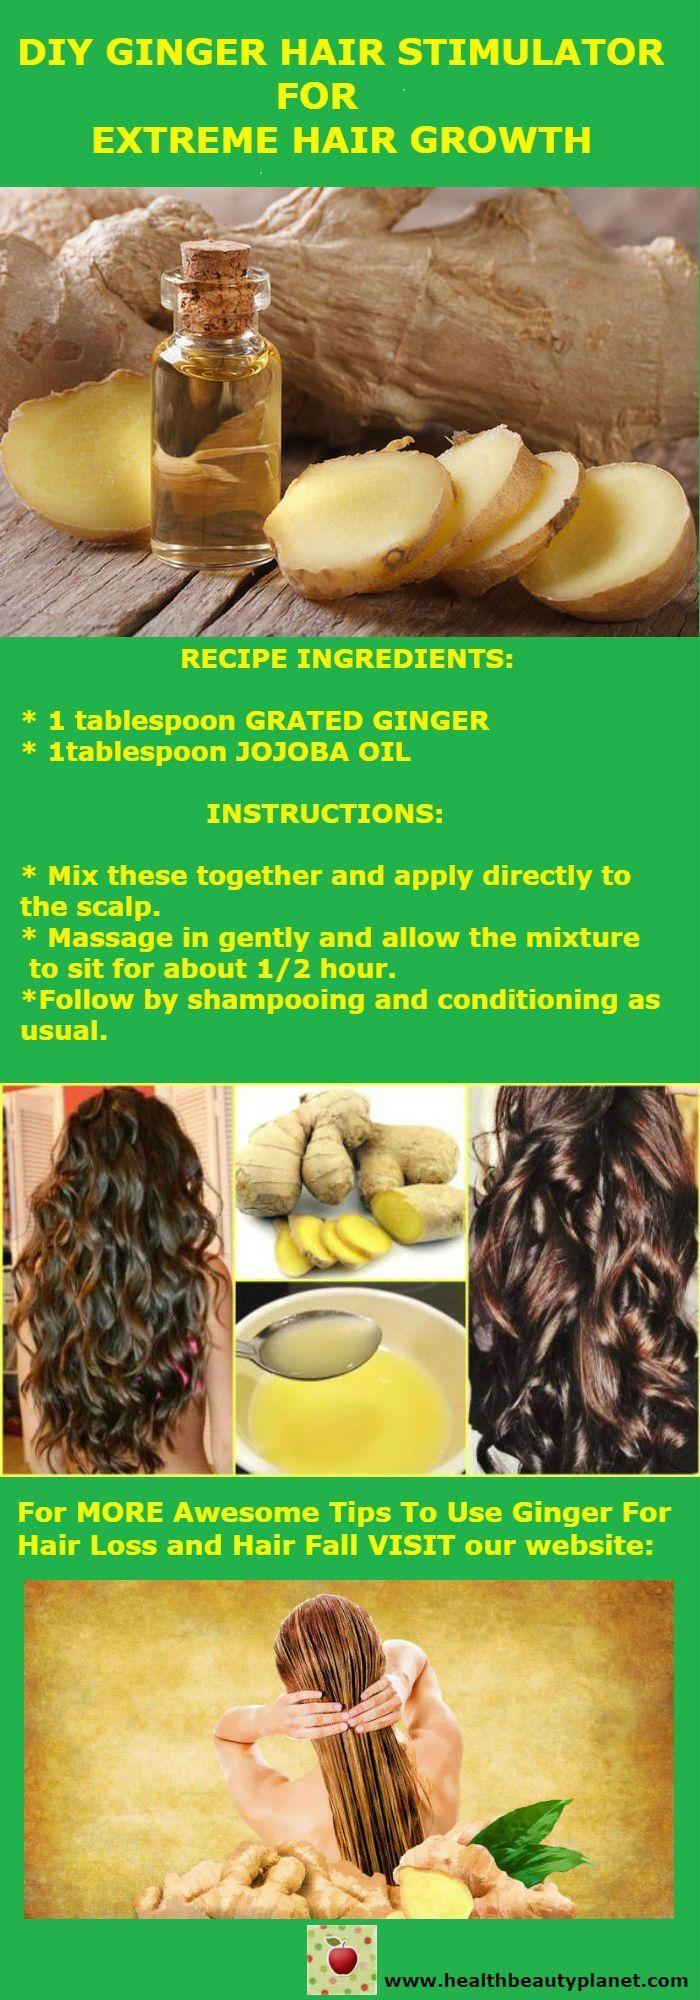 DIY Ginger Hair Stimulator For Extreme Hair Growth